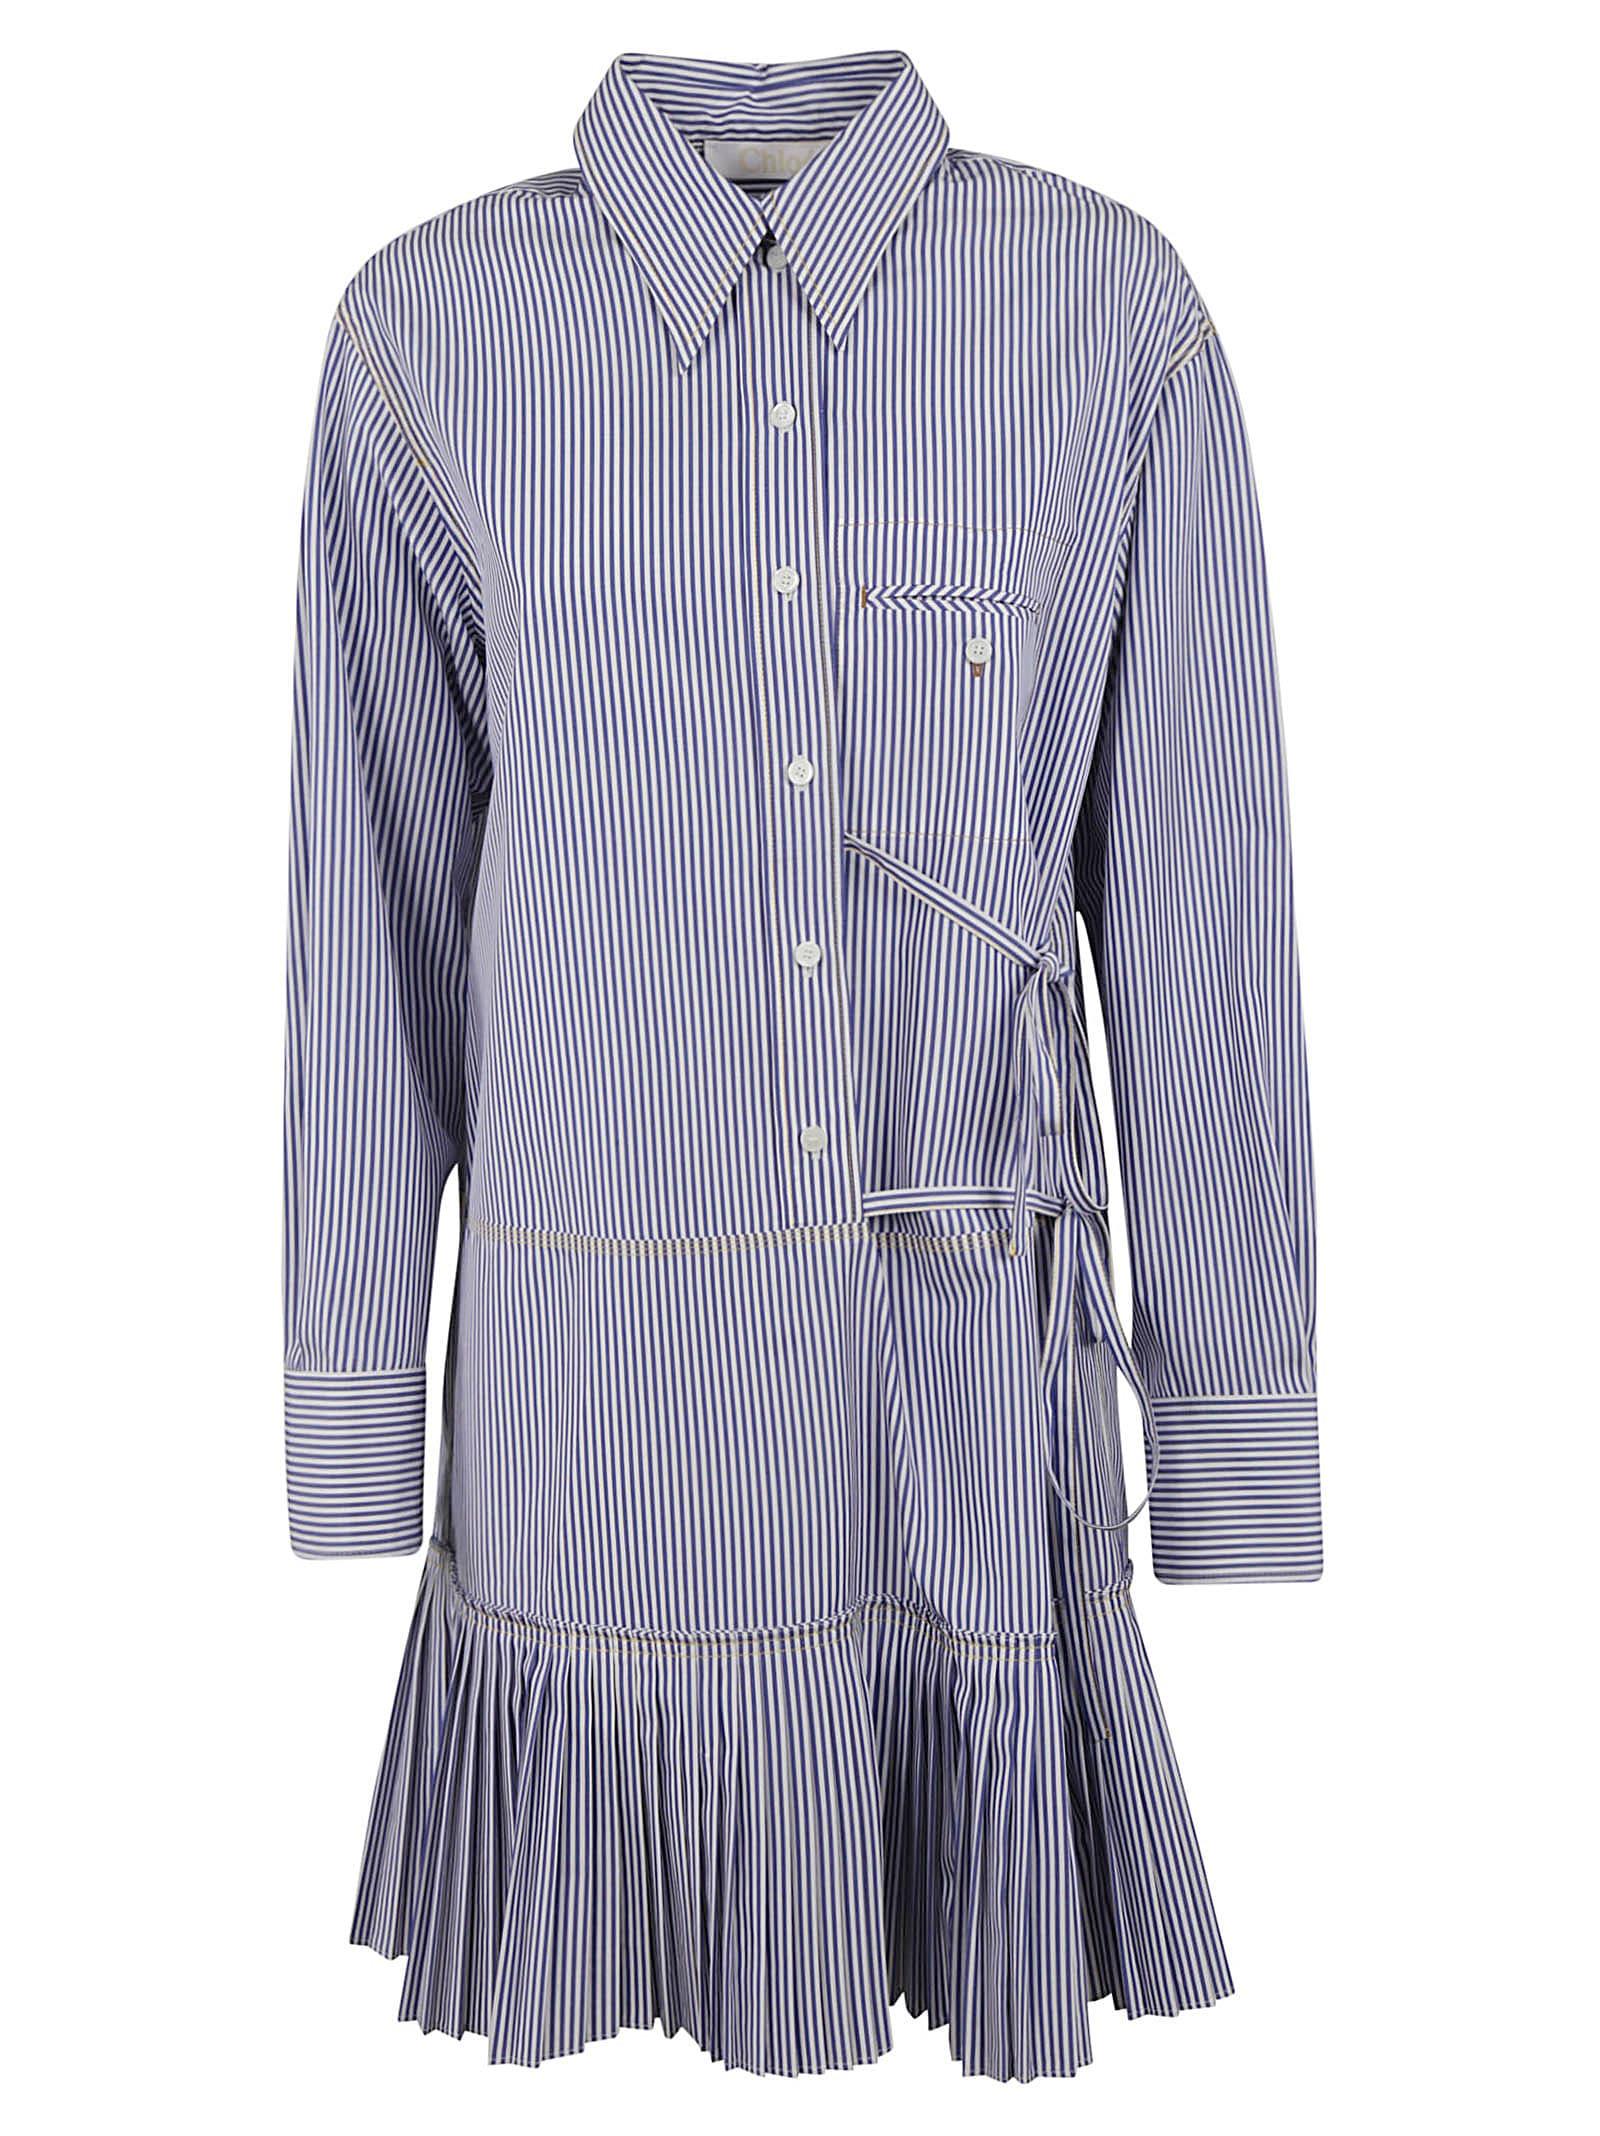 Buy Chloé Stripe Print Pleated Skirt Dress online, shop Chloé with free shipping